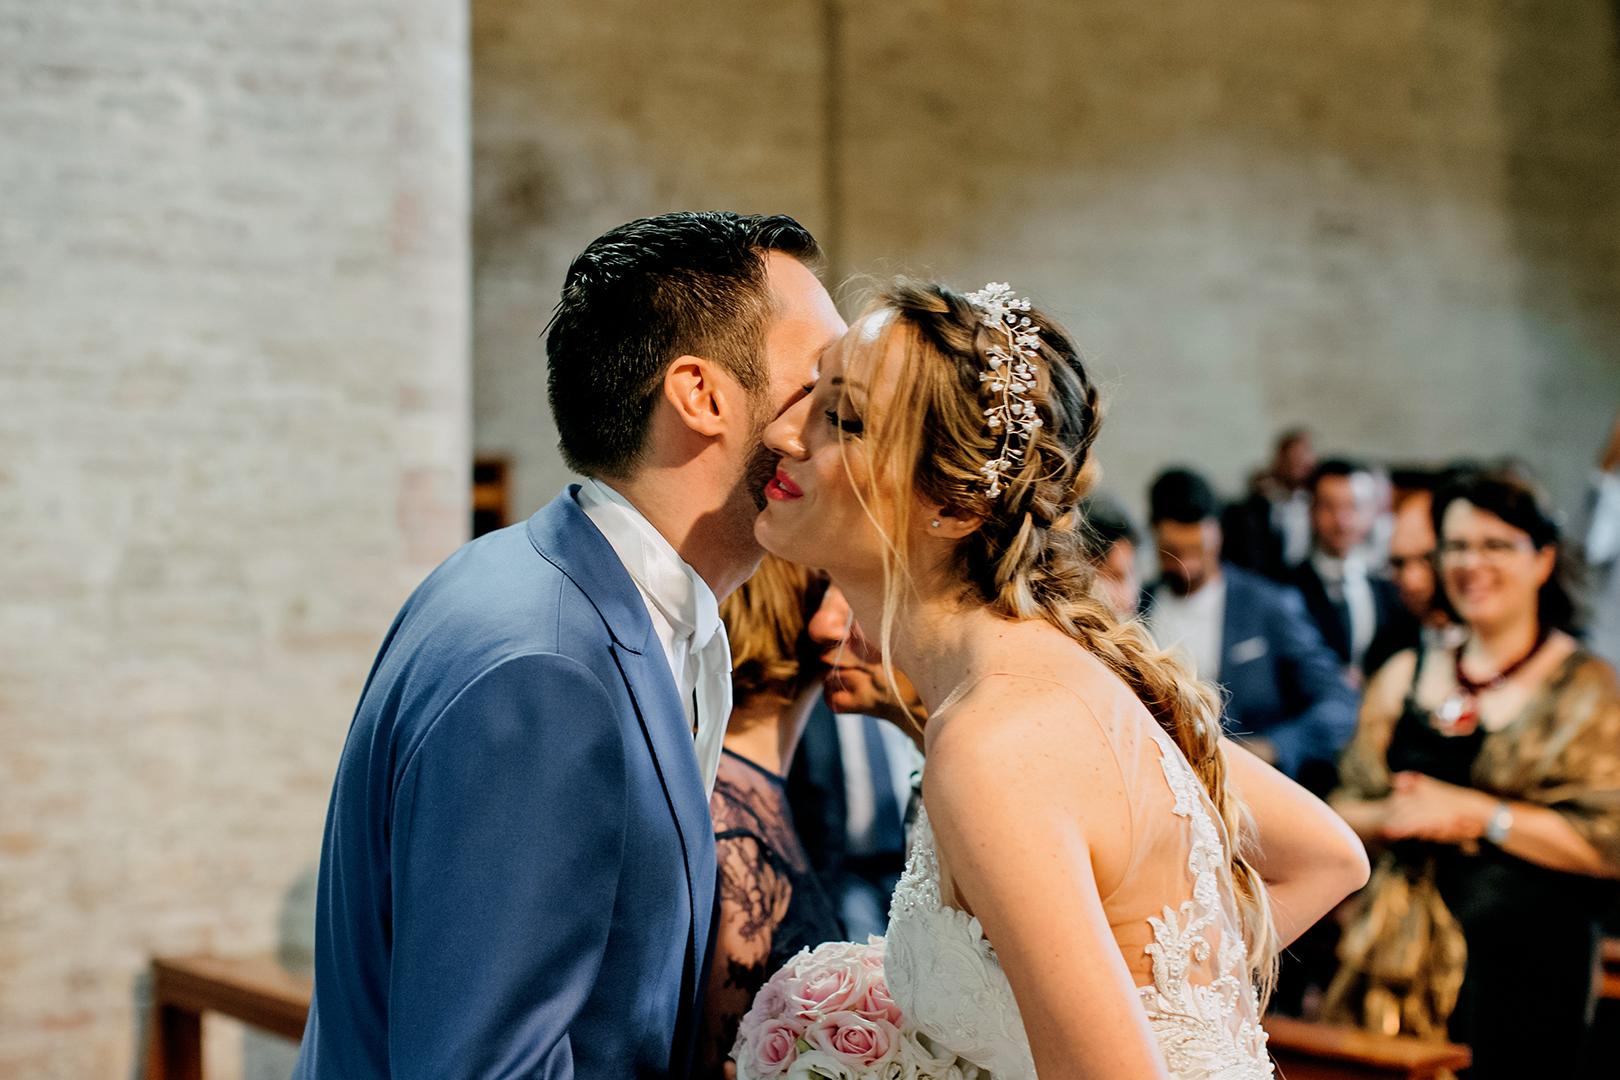 28 gianni-lepore-fotografo-matrimonio-silvi-sposi-bride-groom-incontro-chiesa